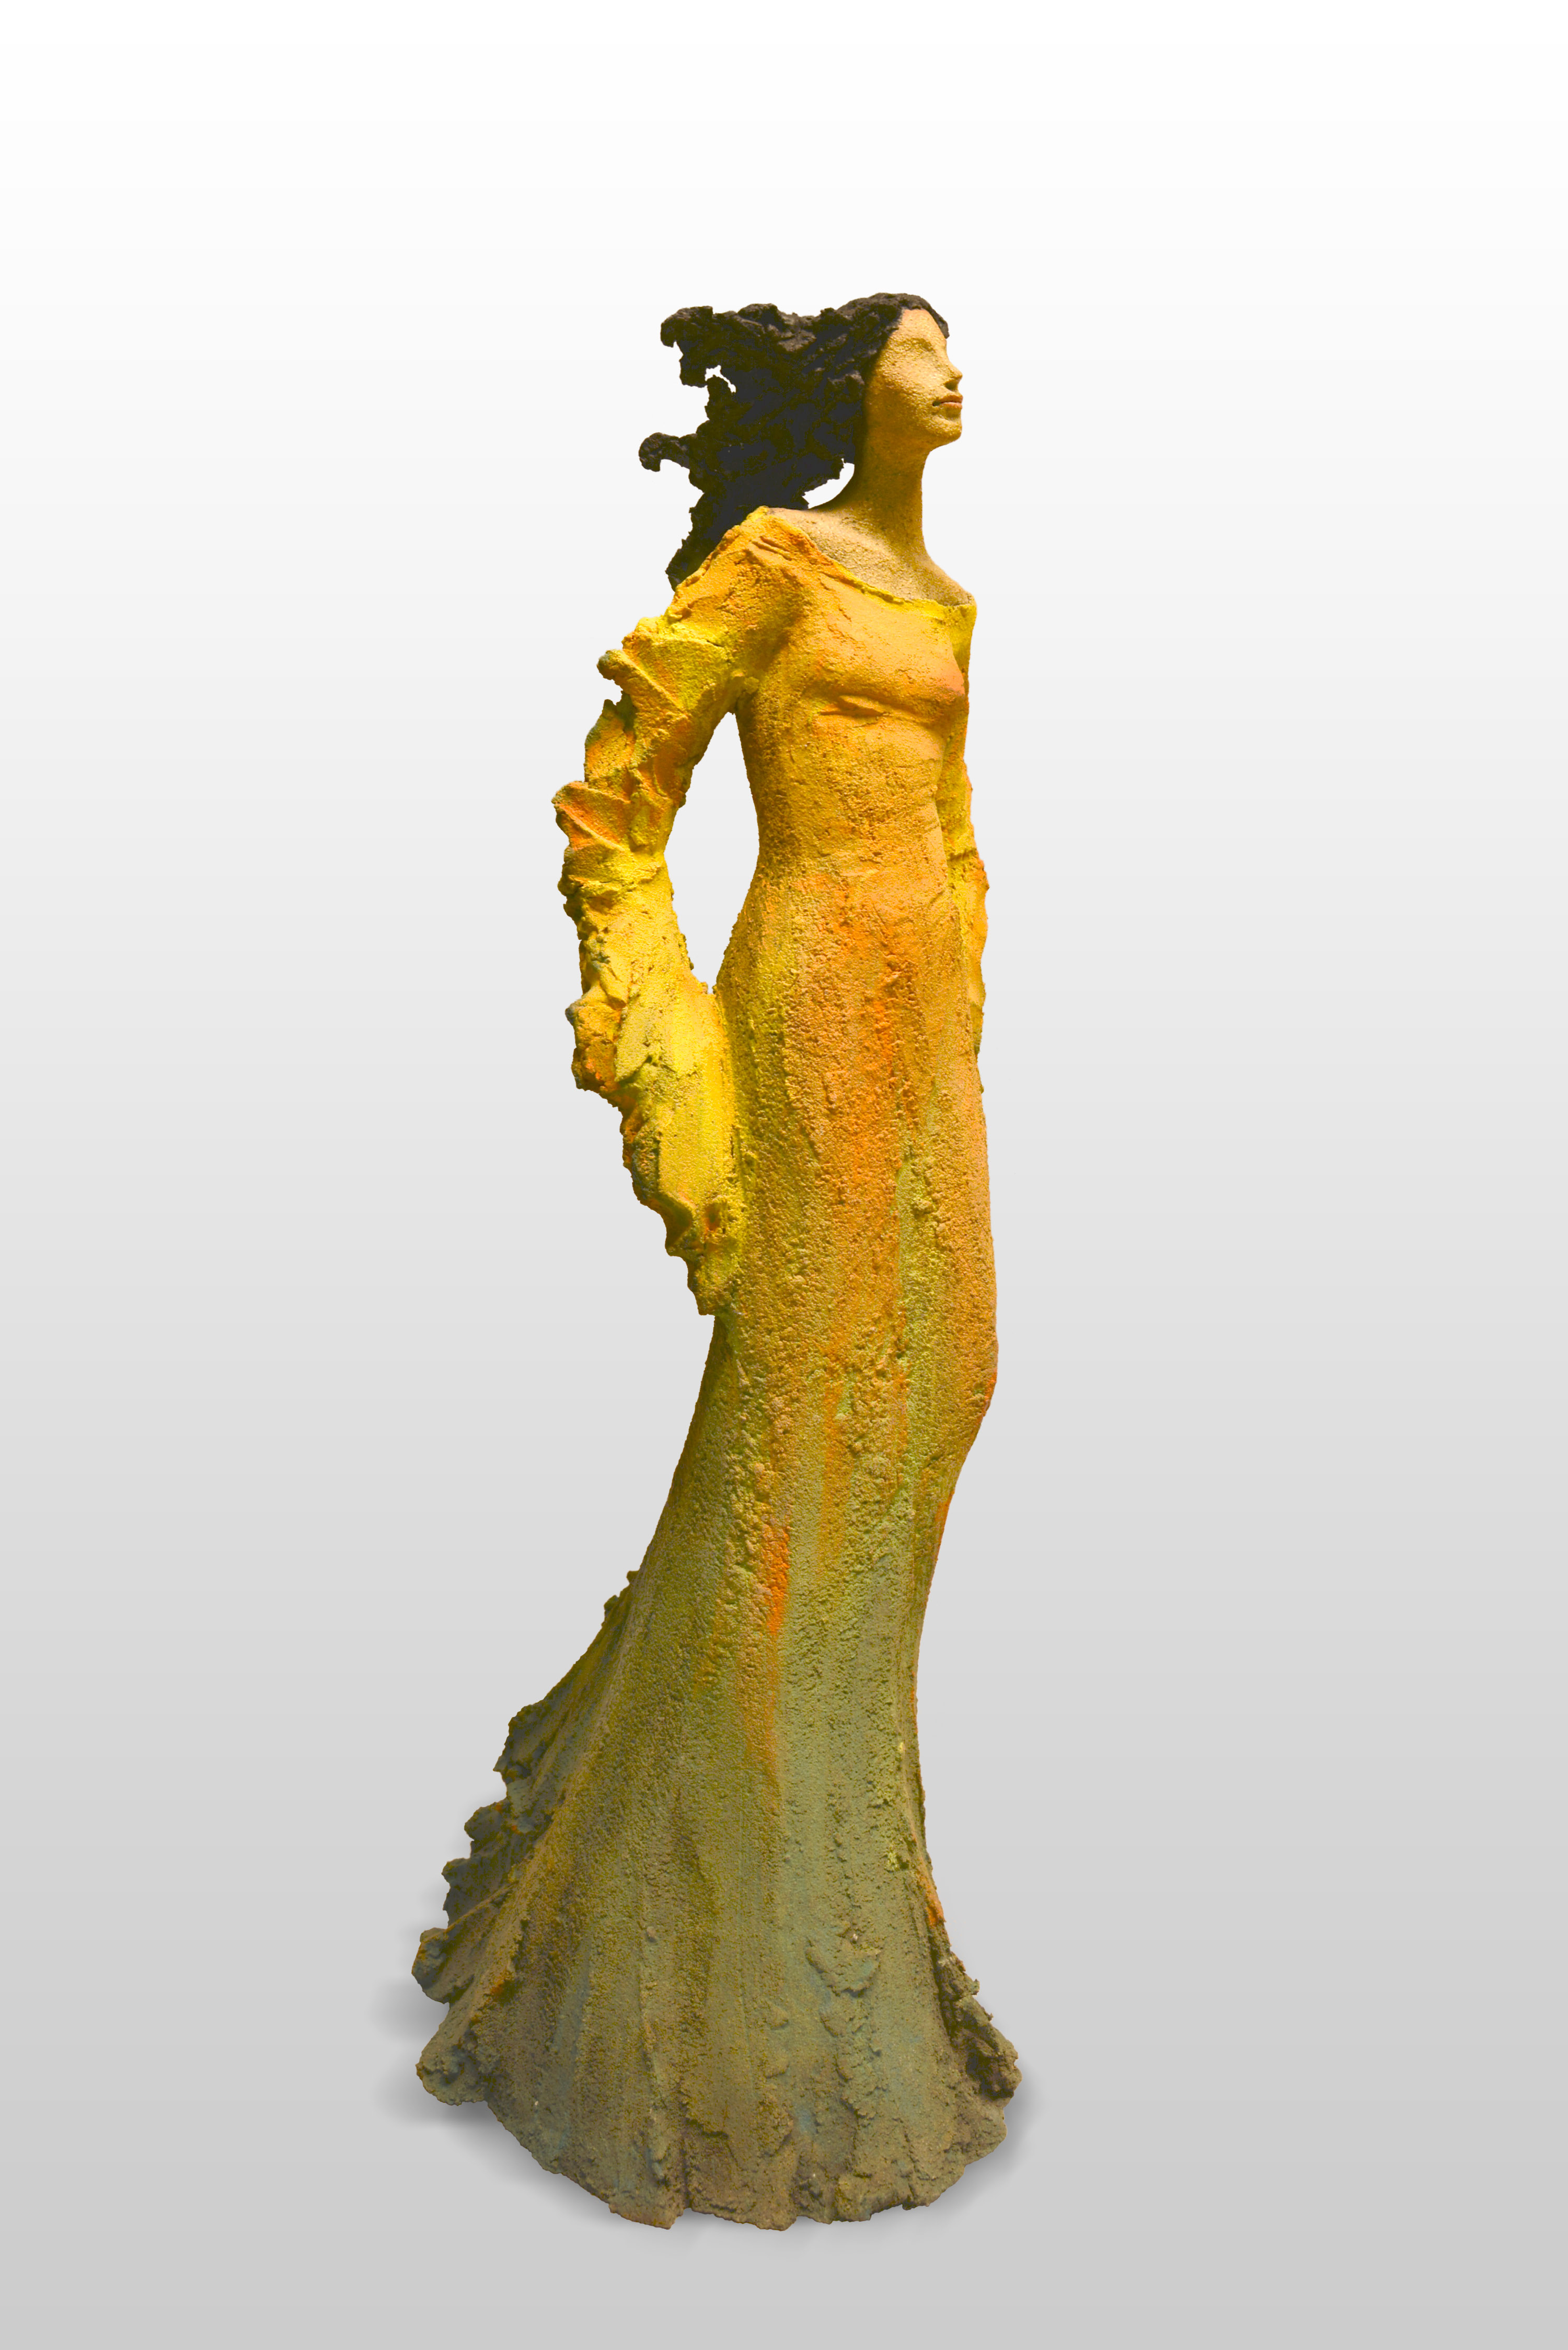 danser, keramikk, skulptur, Ingun Dahlin